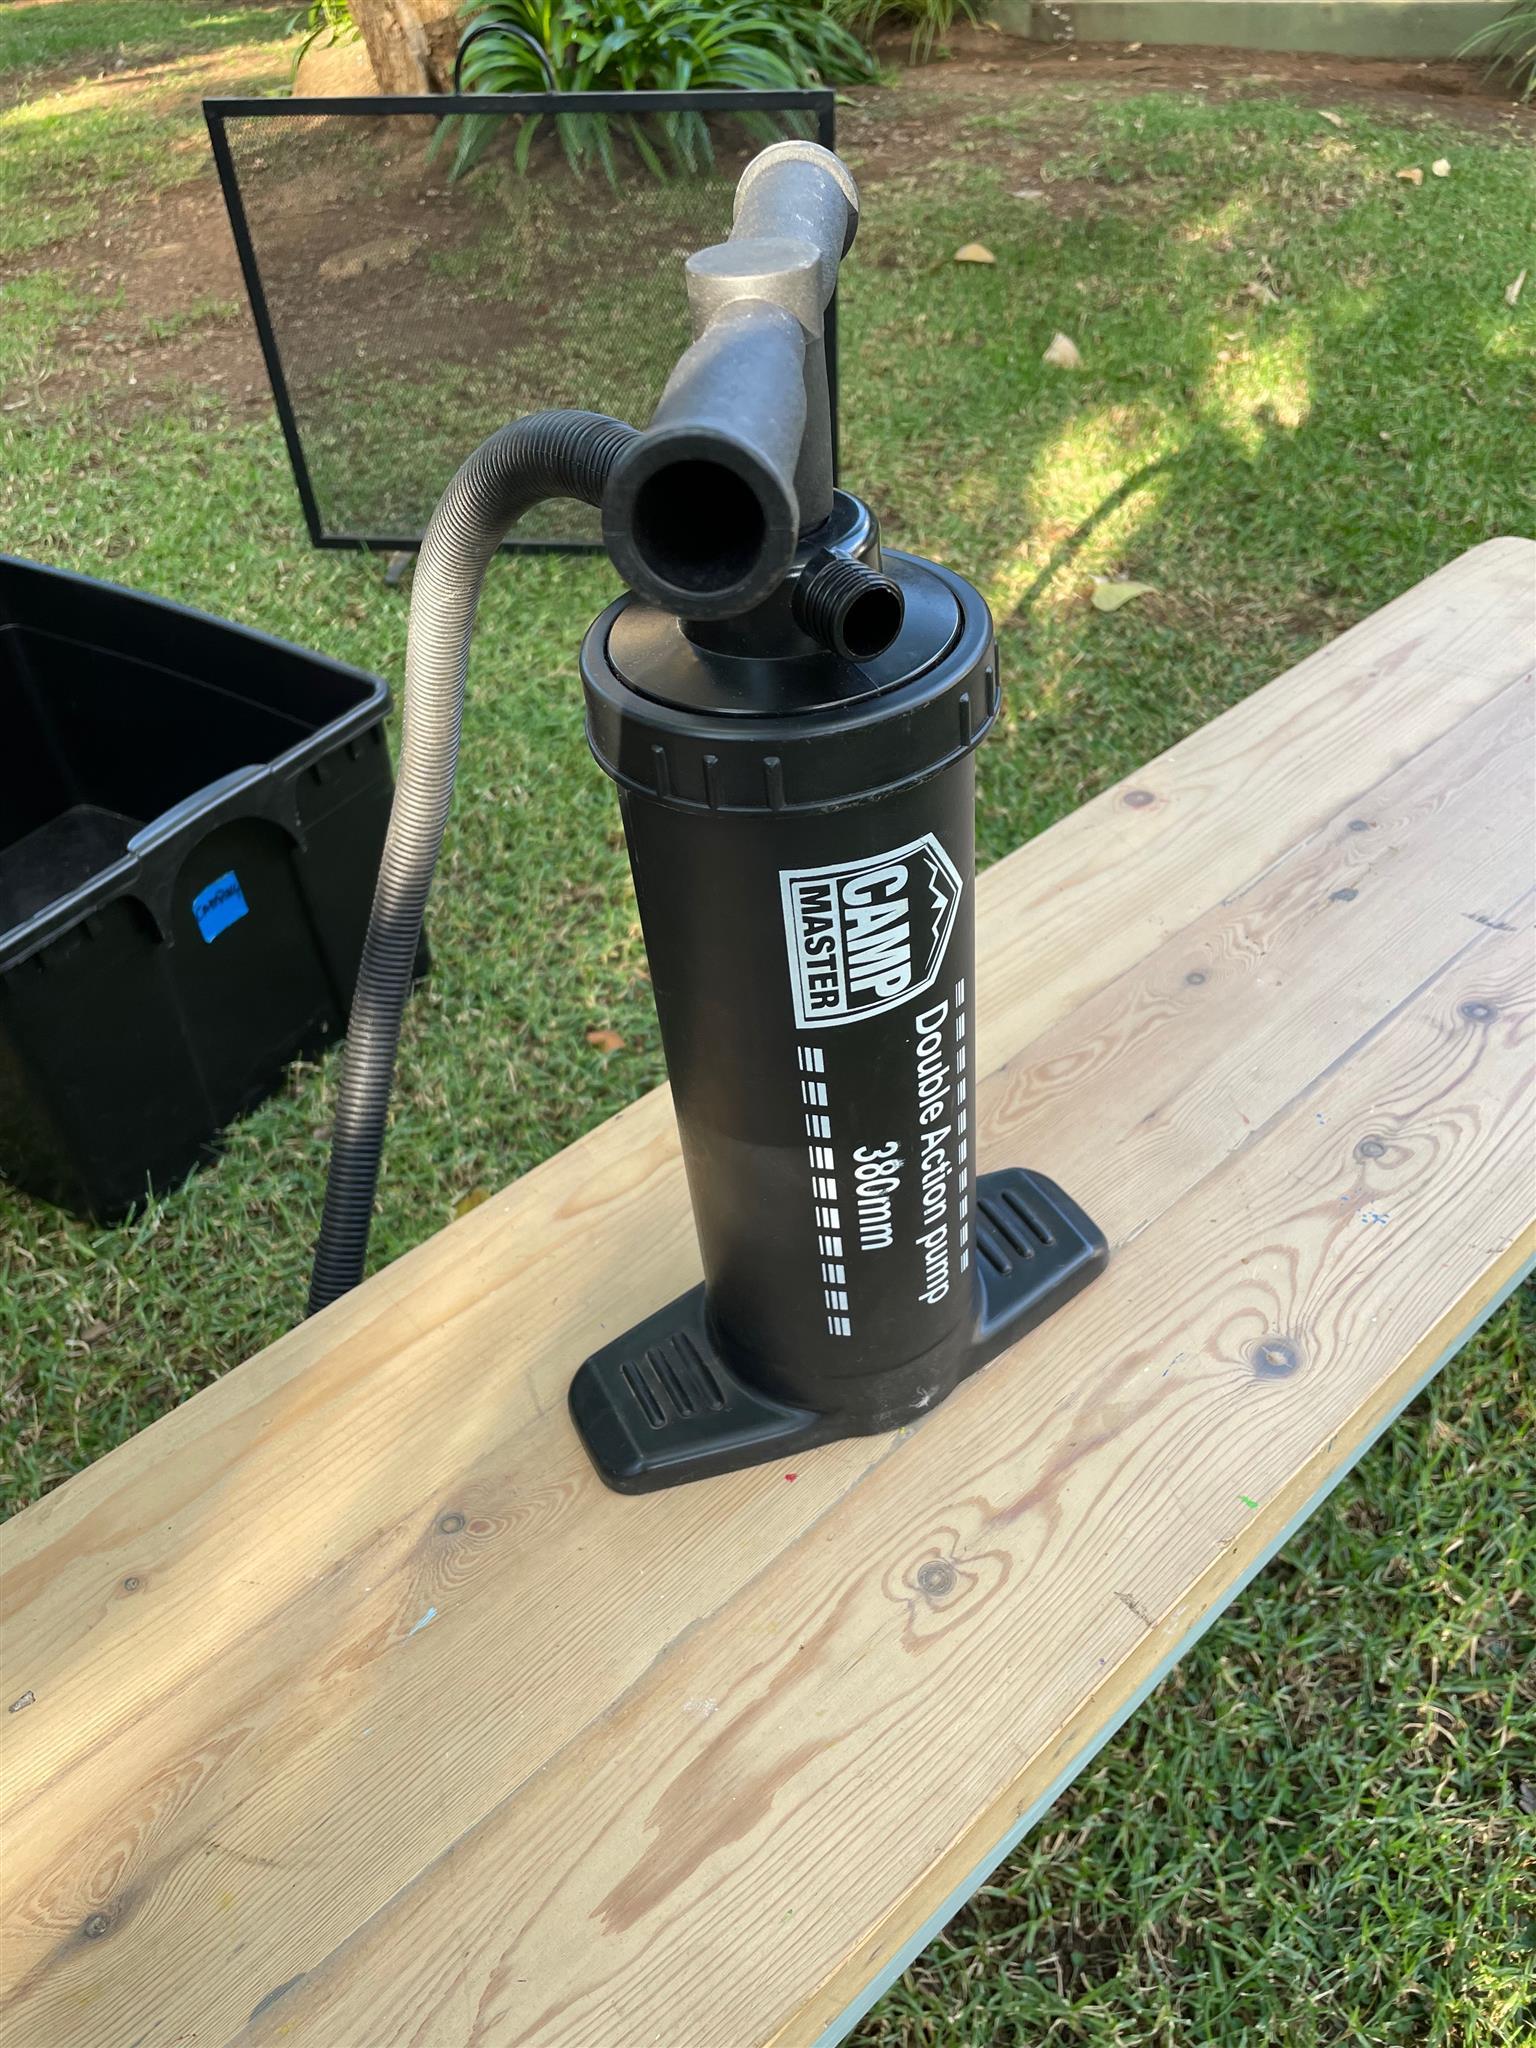 Campmaster Pump for camping mattress